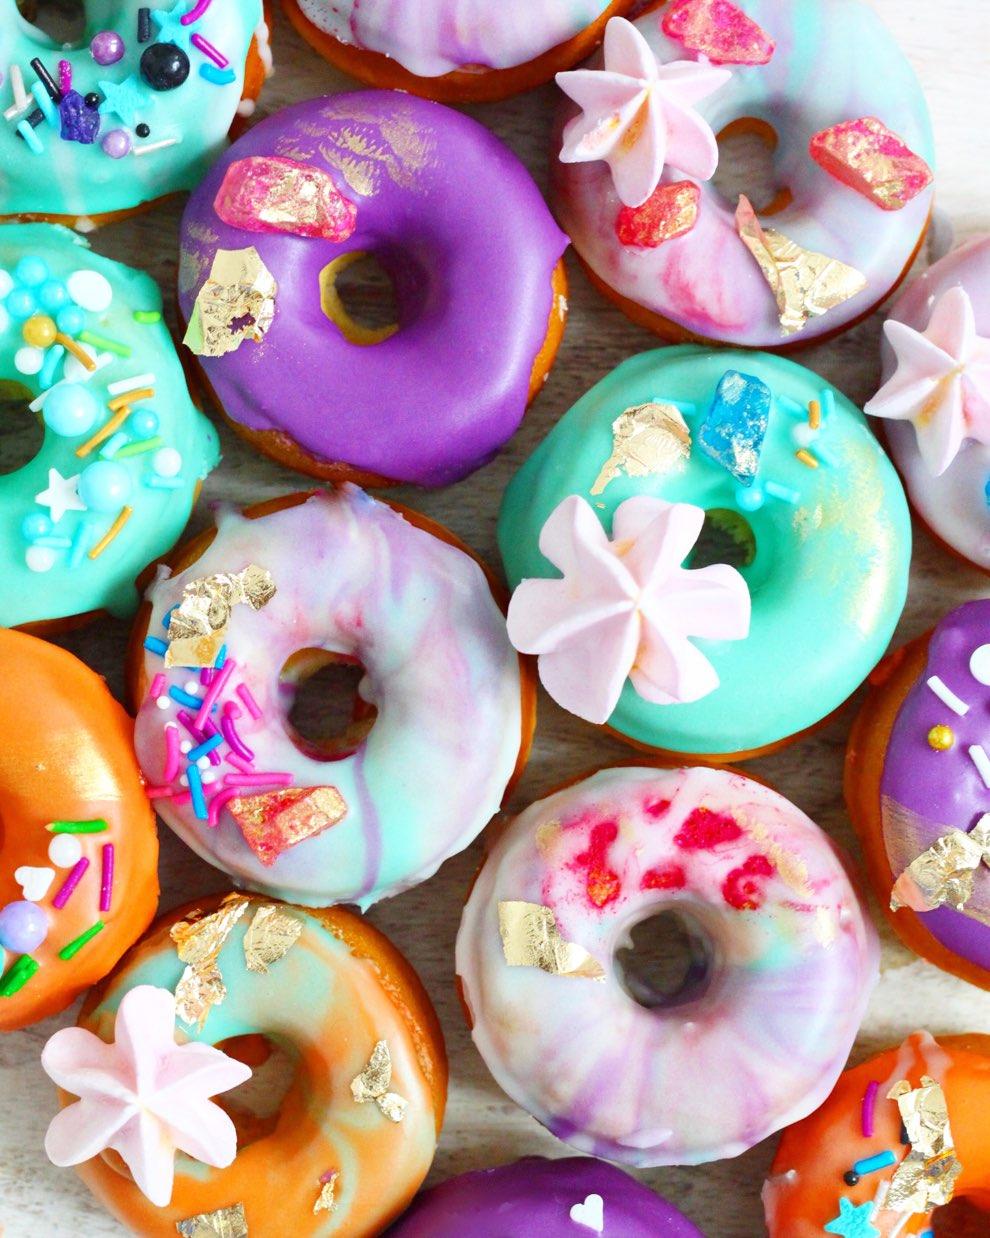 The Best Baked Vegan Vanilla Doughnuts